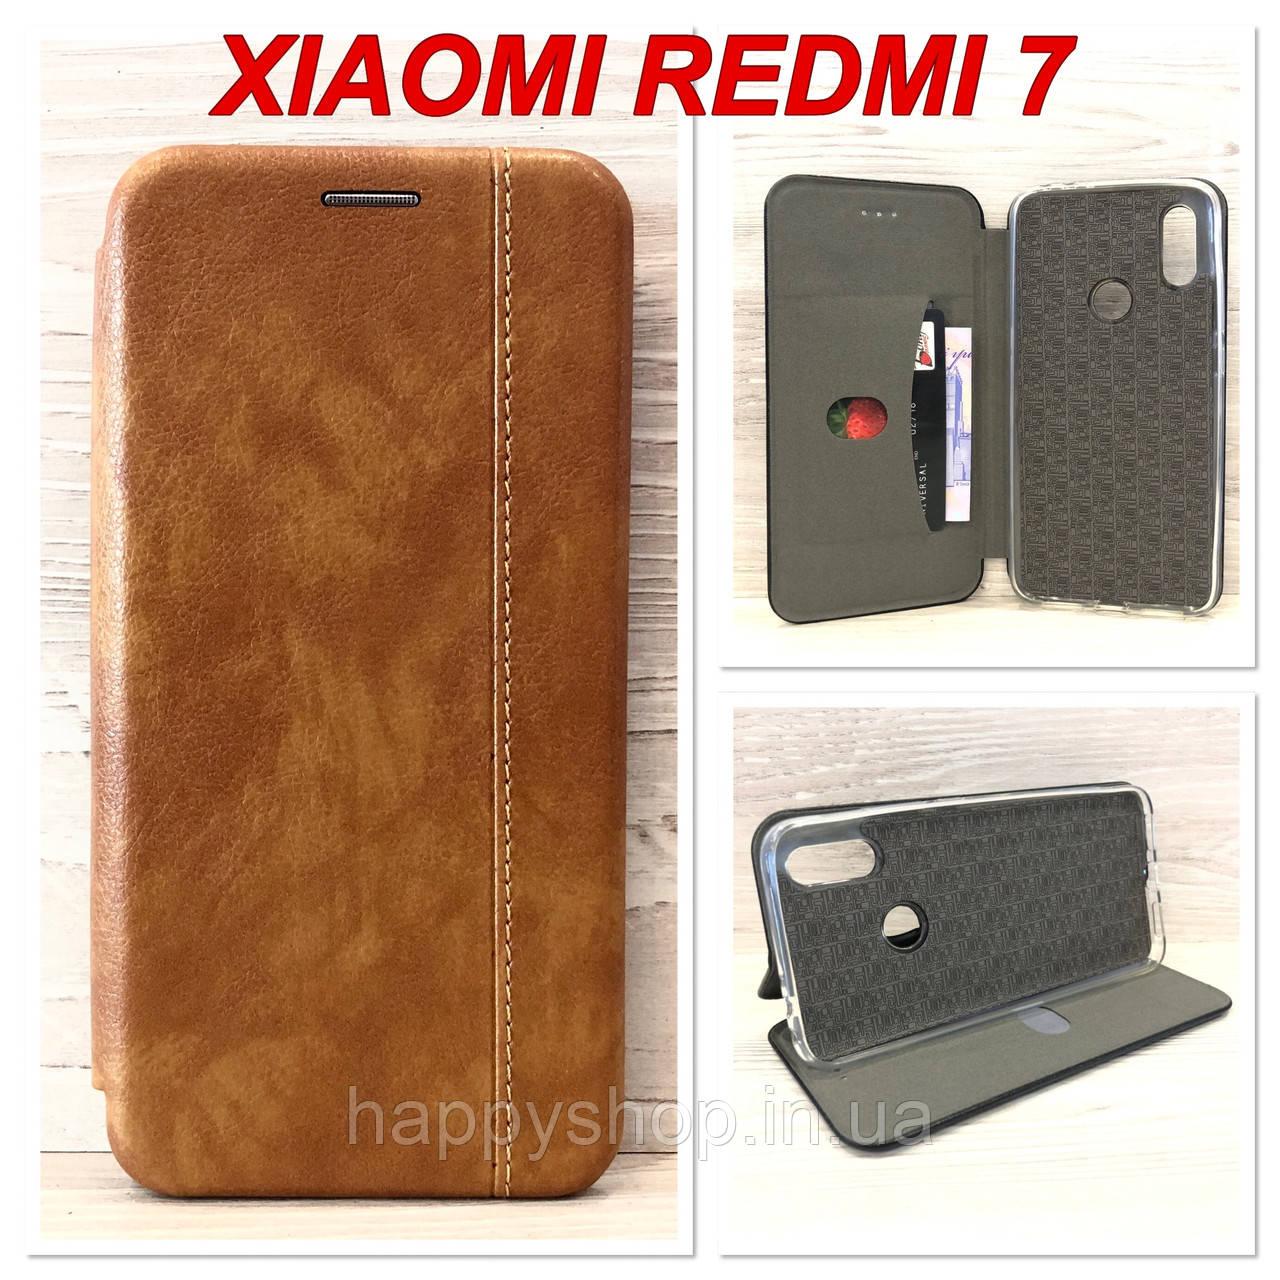 Чохол-книжка Gelius Leather для Xiaomi Redmi 7 (Коричневий)